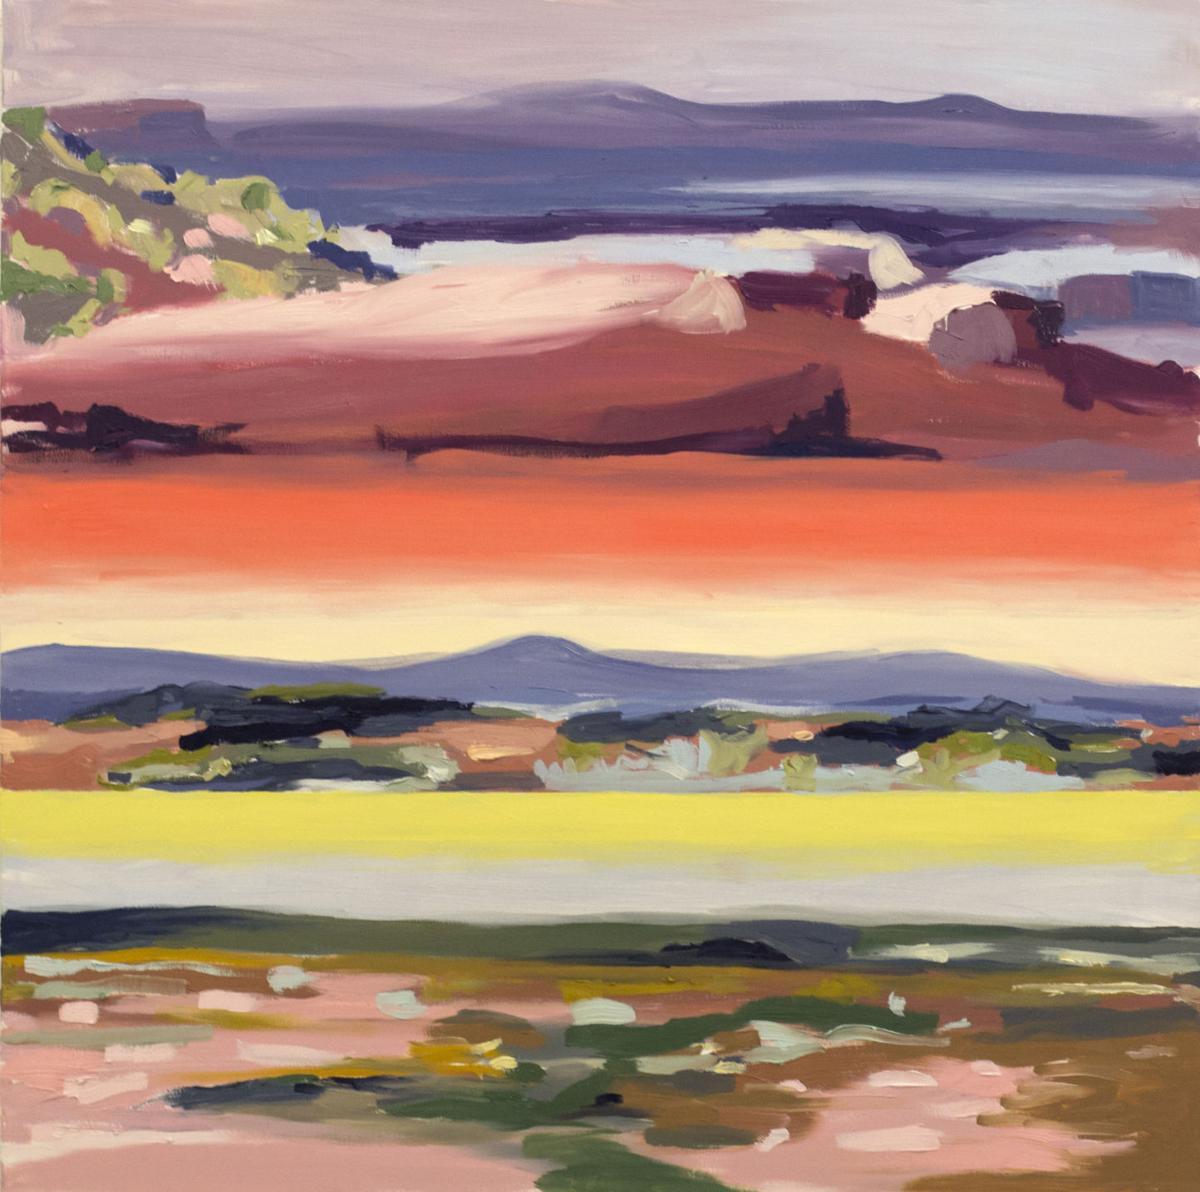 """Desert Velocity Arizona"" by Meghan Bergeron"